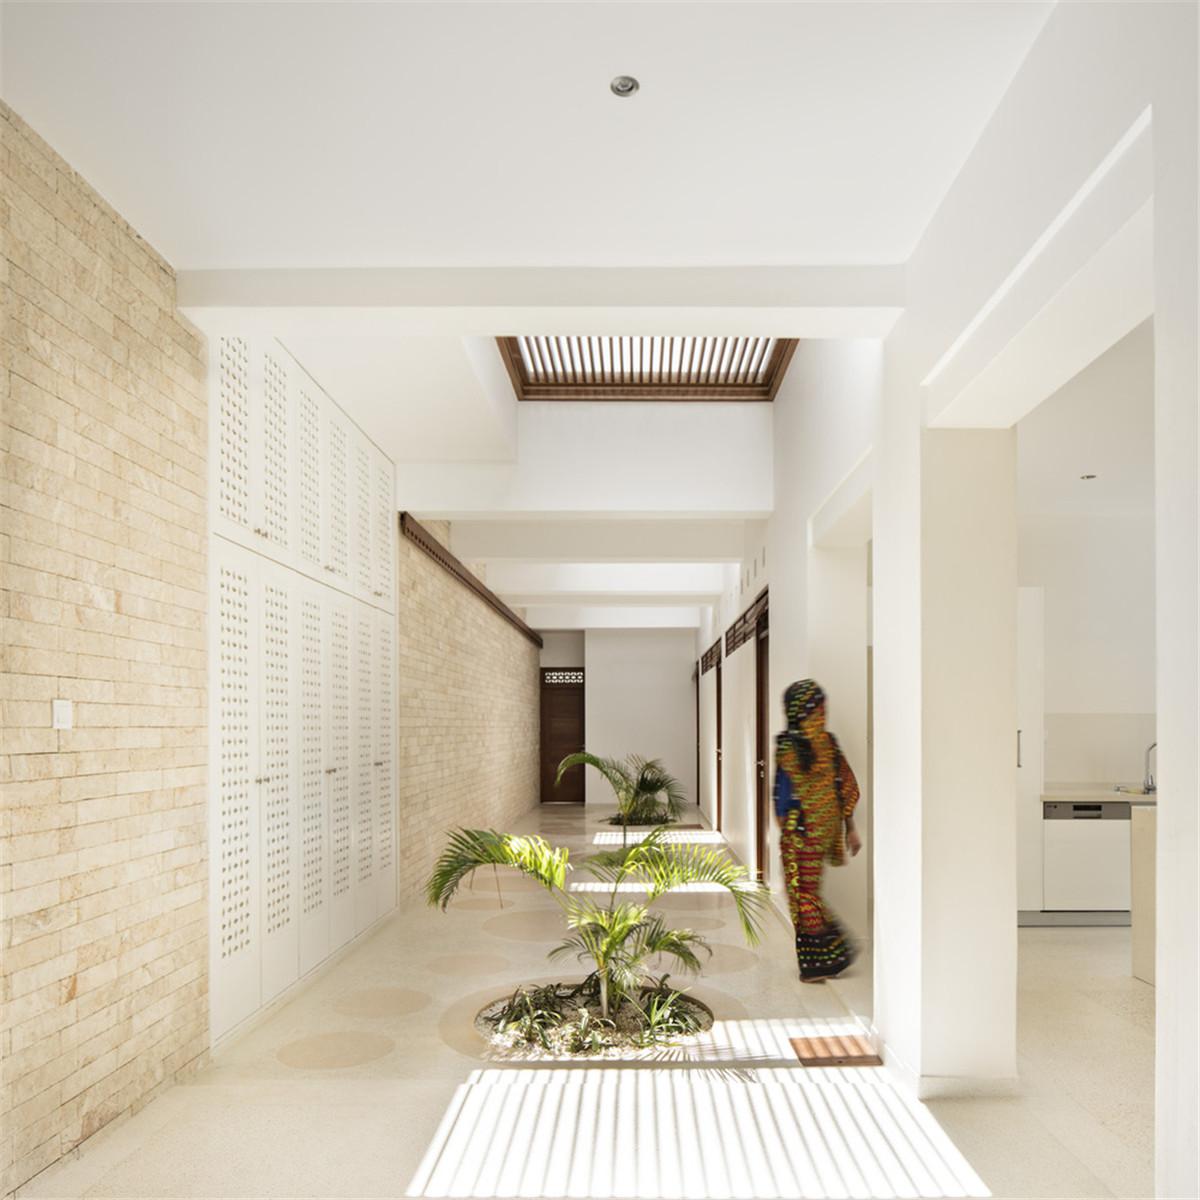 Urko_Sanchez_Architects_-_Tudor_Apartments_08.jpg